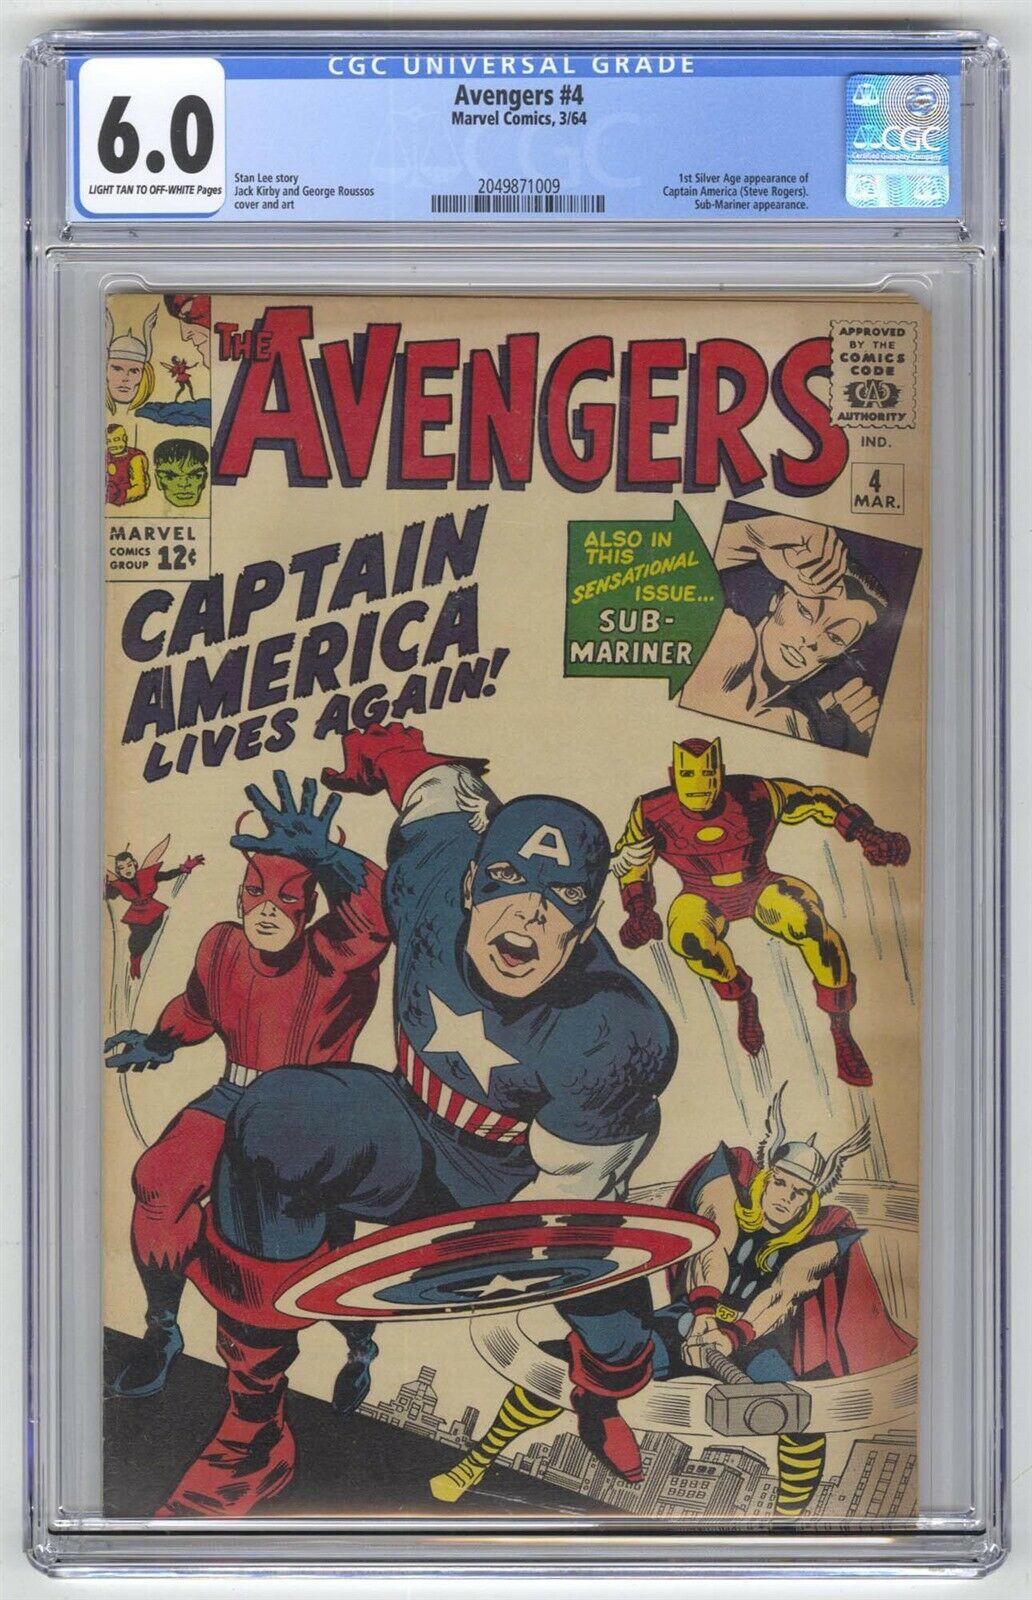 Avengers #4 CGC 6.0 VINTAGE Marvel Comic MEGA KEY 1st Silver Age Captain America